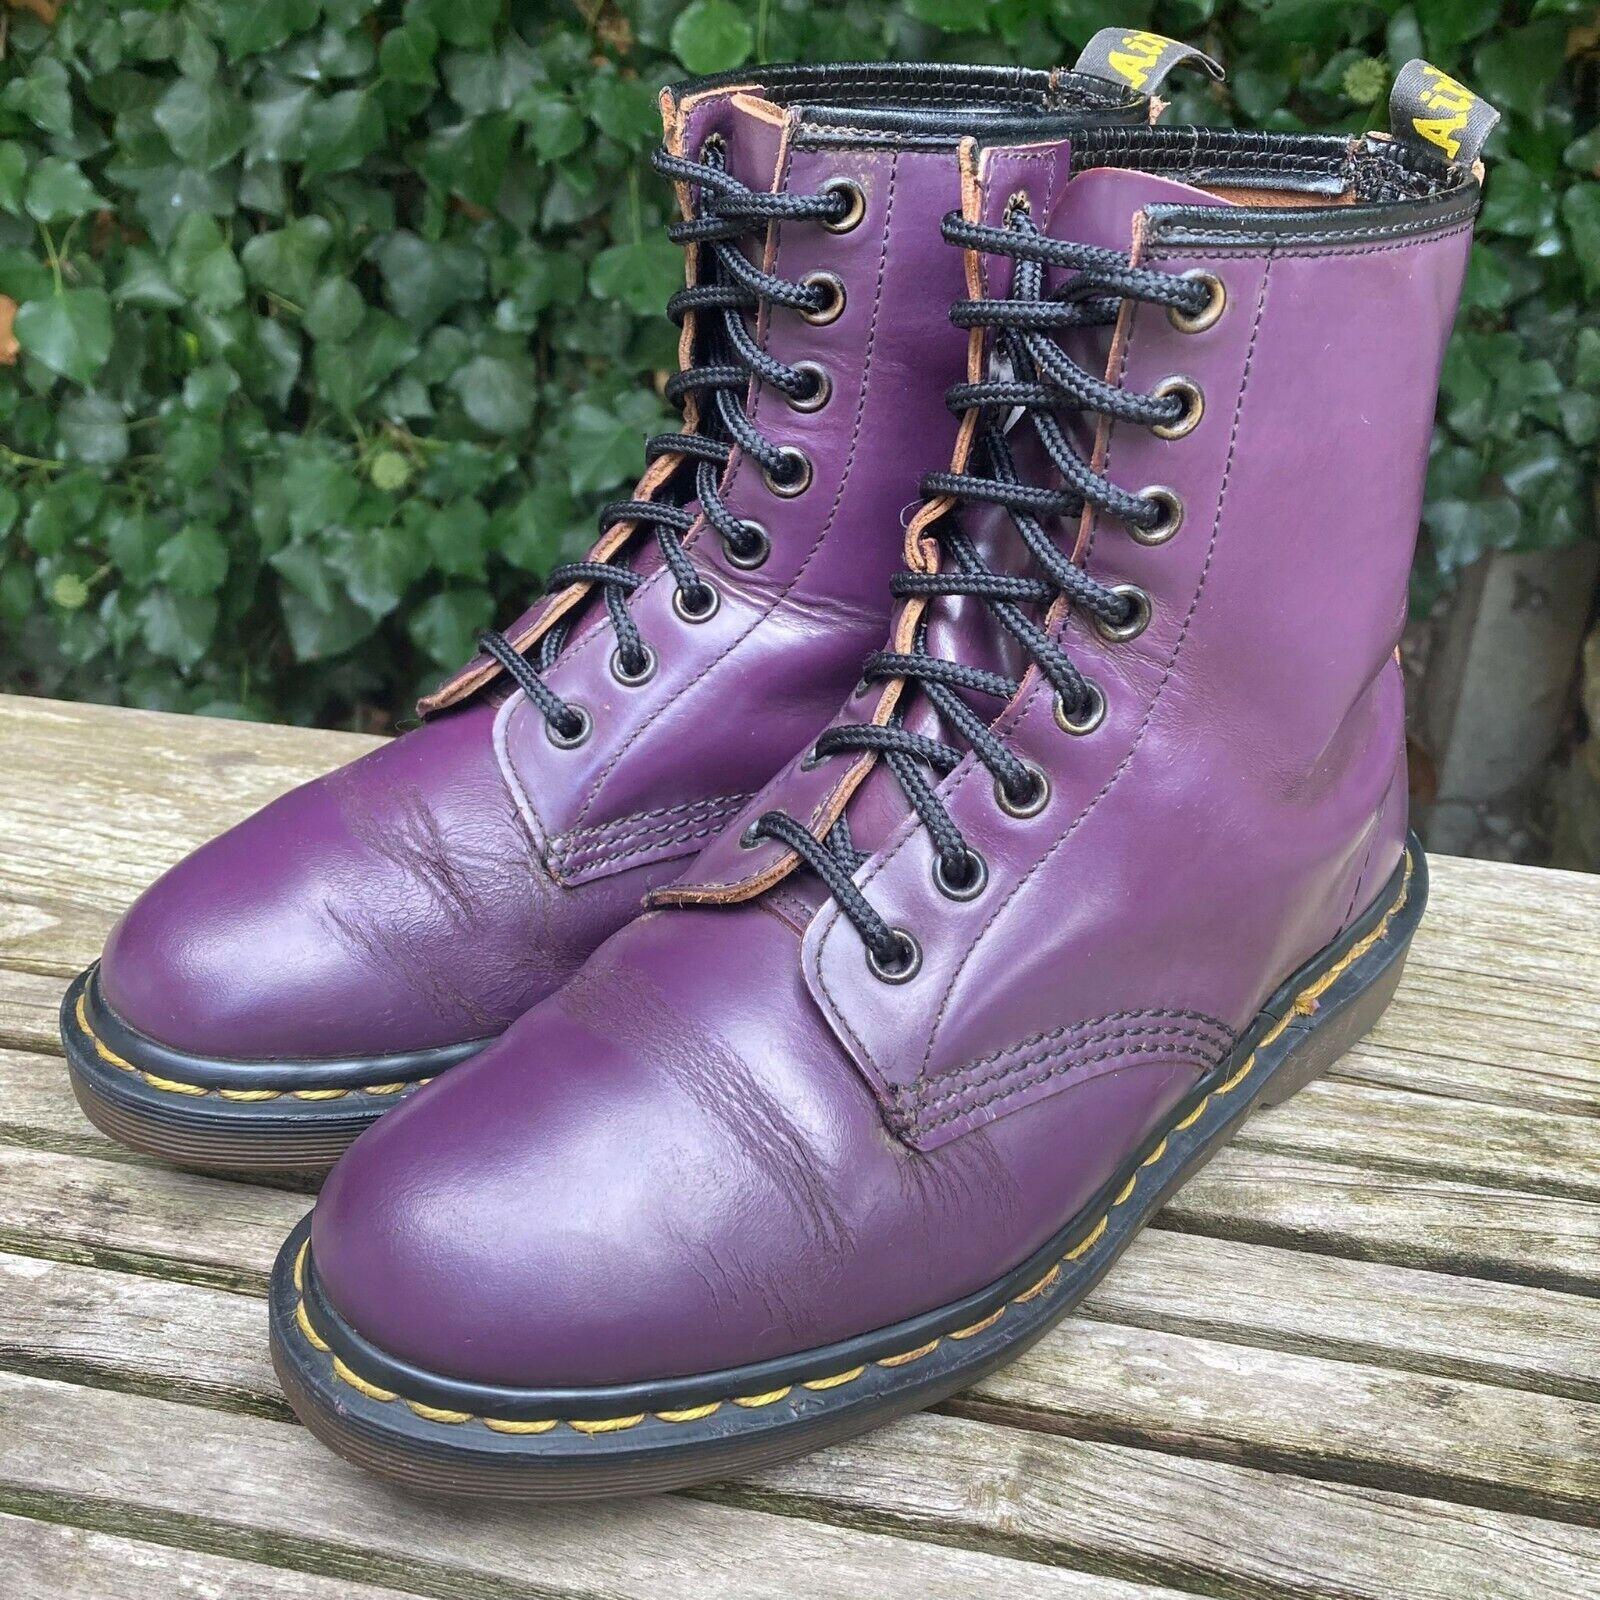 Vintage Dr Martens 1460 purple leather boots docs size UK 5 EU38 Made in England